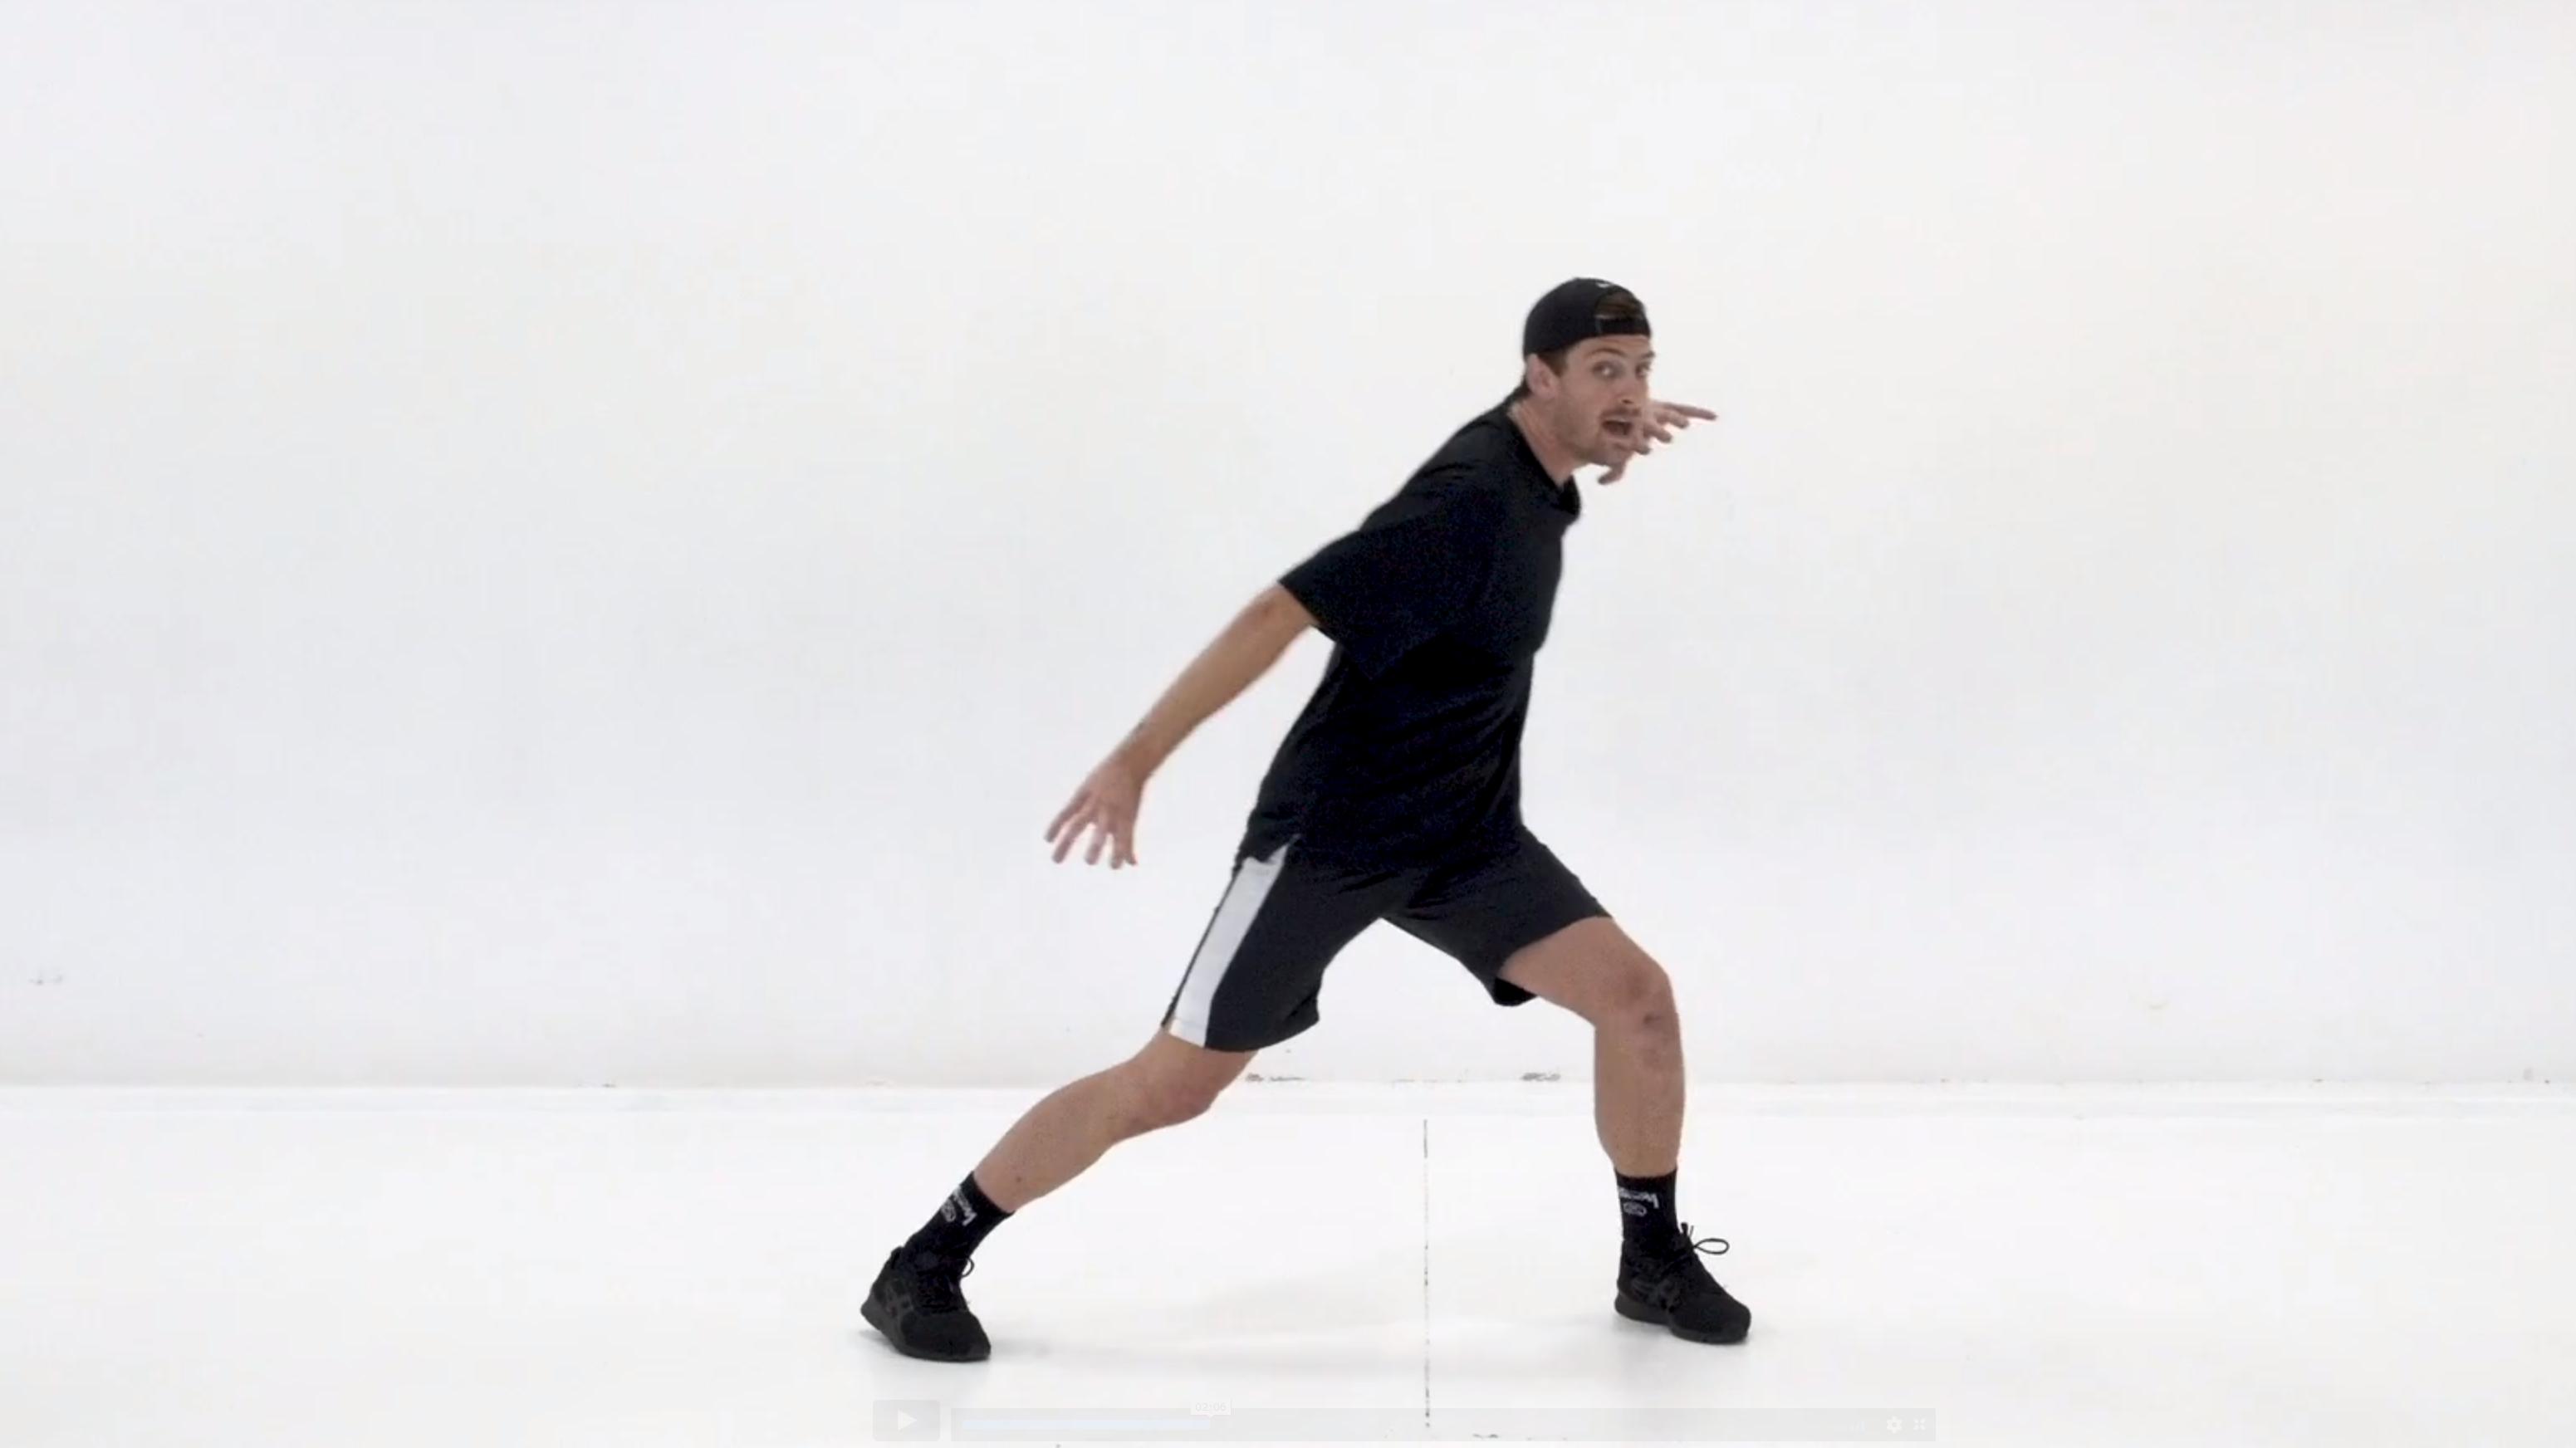 Hip hop choreography – 2. Schools Spectacular Dance Crew experience